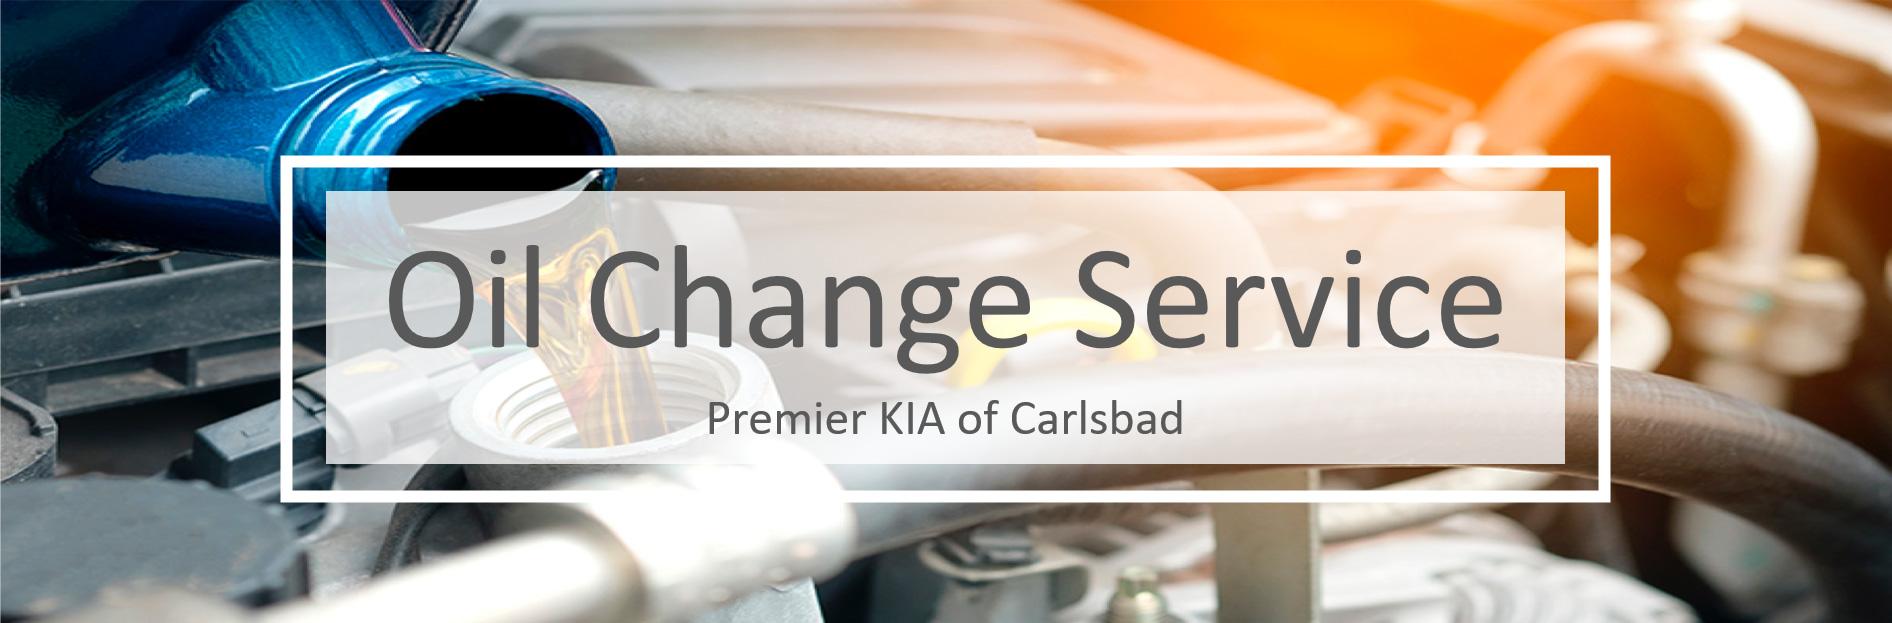 Oil Change Service at Premier Kia of Carlsbad